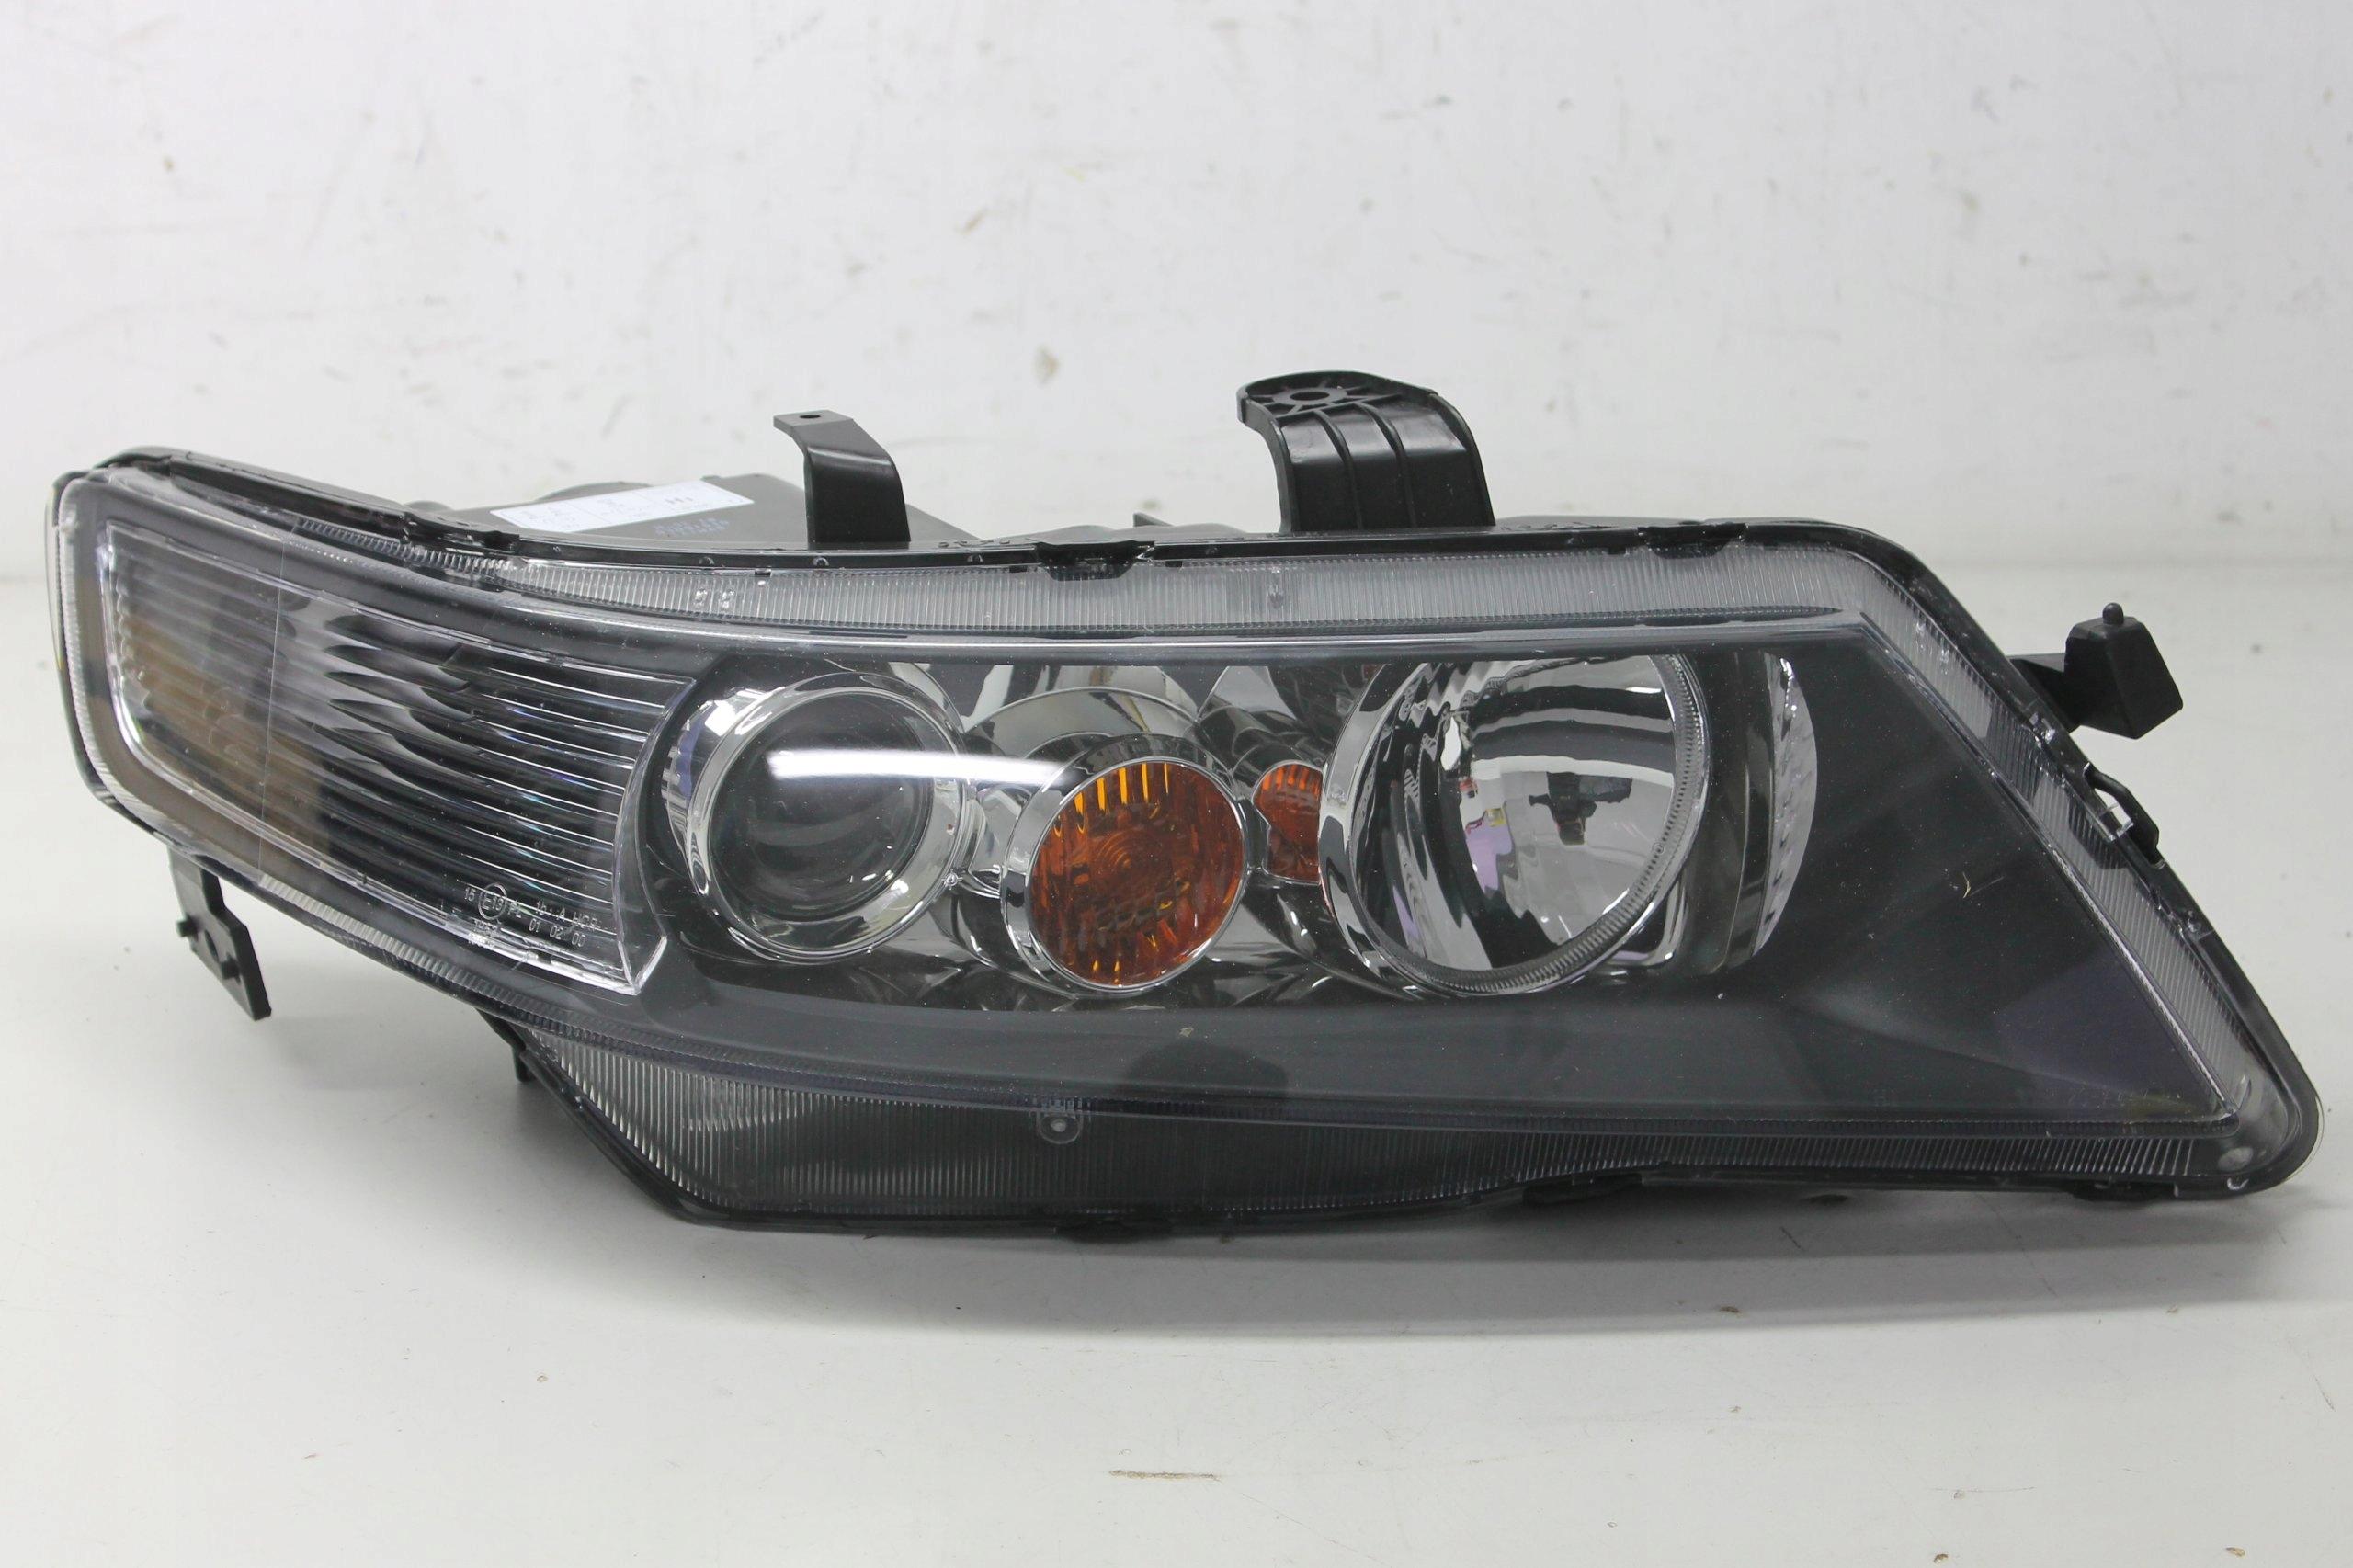 Honda Accord Vii Lampa Przednia Prawa Uk 7078368333